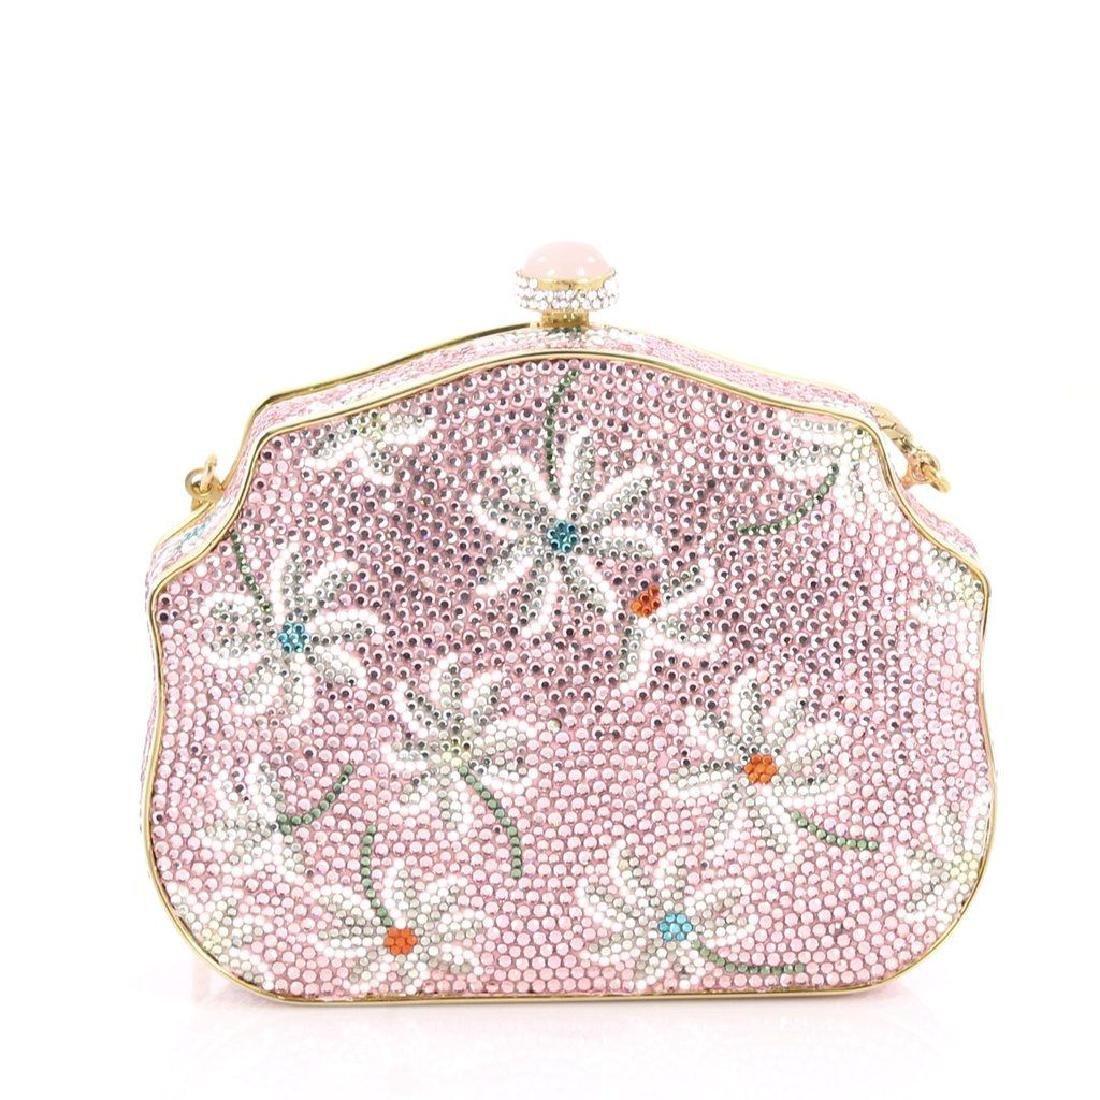 Judith Leiber Crystal Floral Minaudiere Chain Bag - 2